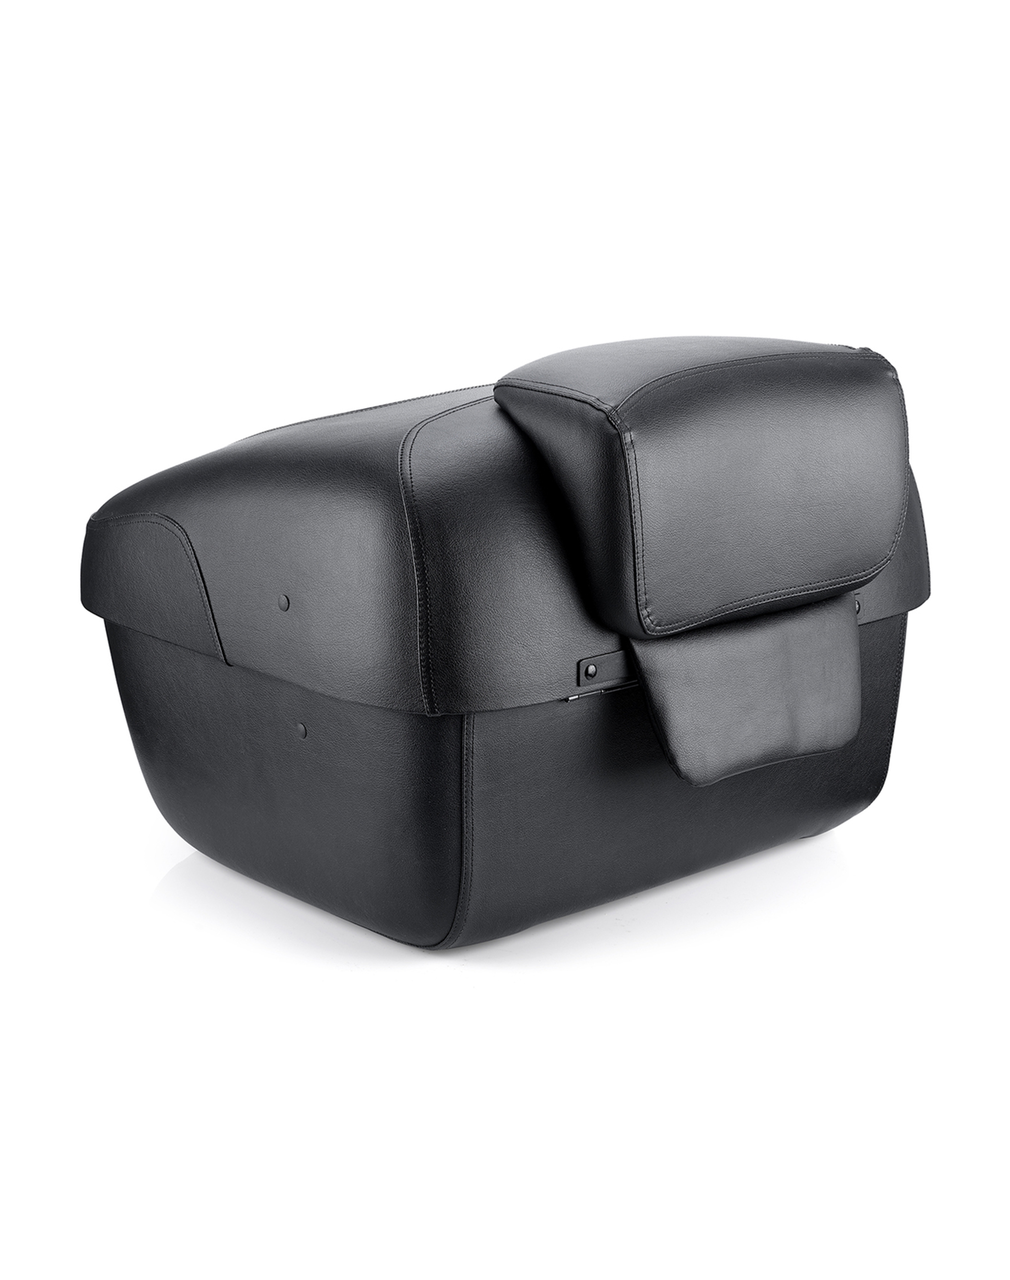 Honda Viking Premium Leather Wrapped Hard Trunk Back View